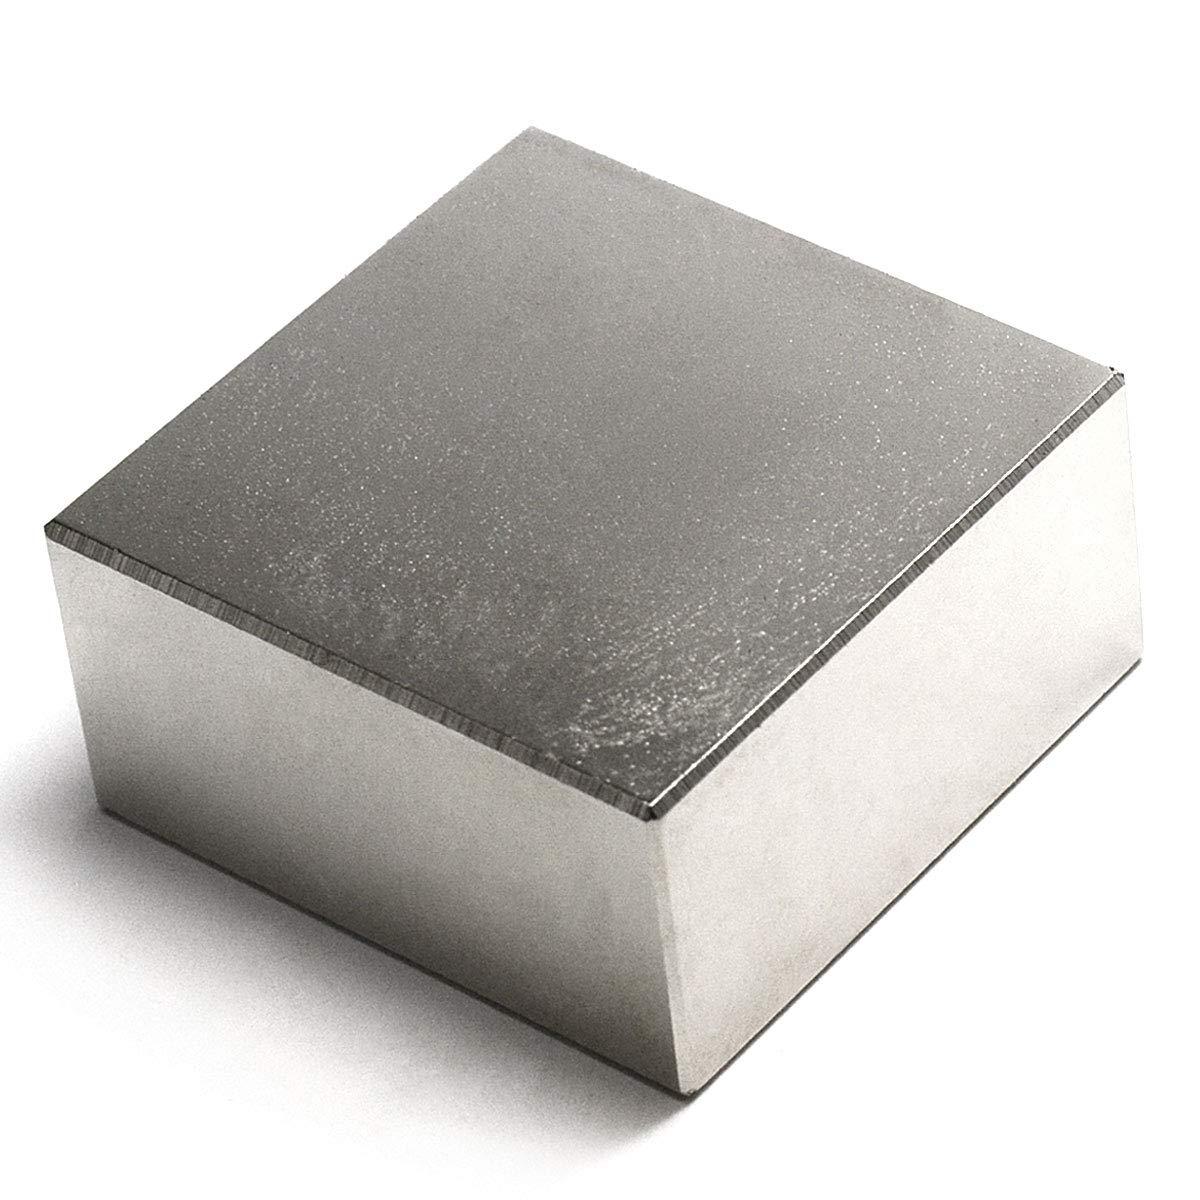 Neodymium Magnets N50 2'' x 2'' x 1'' NdFeB Rare Earth Rectangular Magnet 1-Count